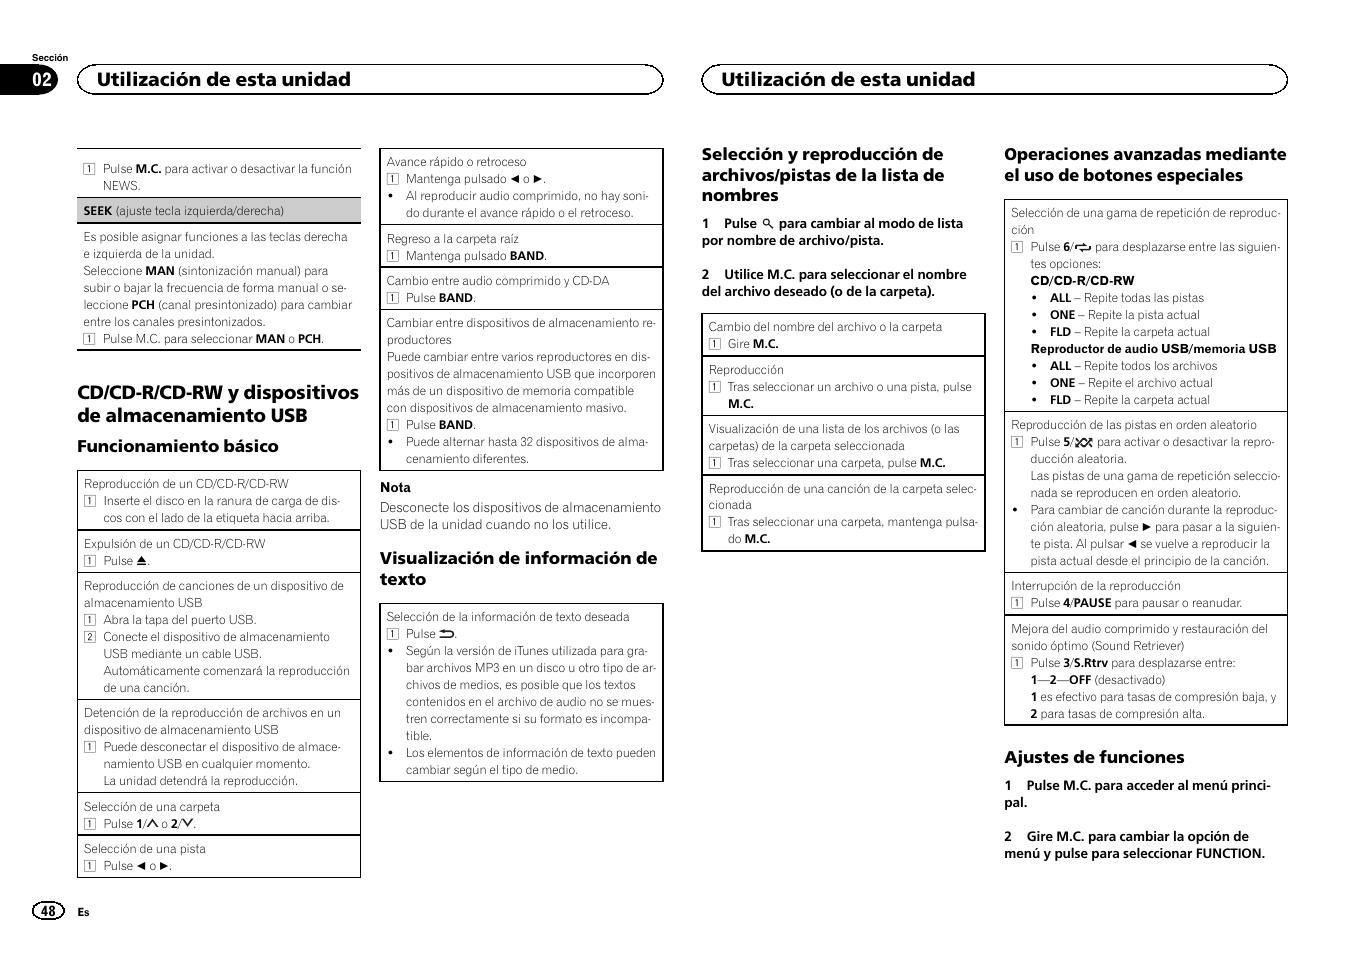 Seek, Seek (ajuste tecla izquierda/derecha), Cd/cd-r/cd-rw